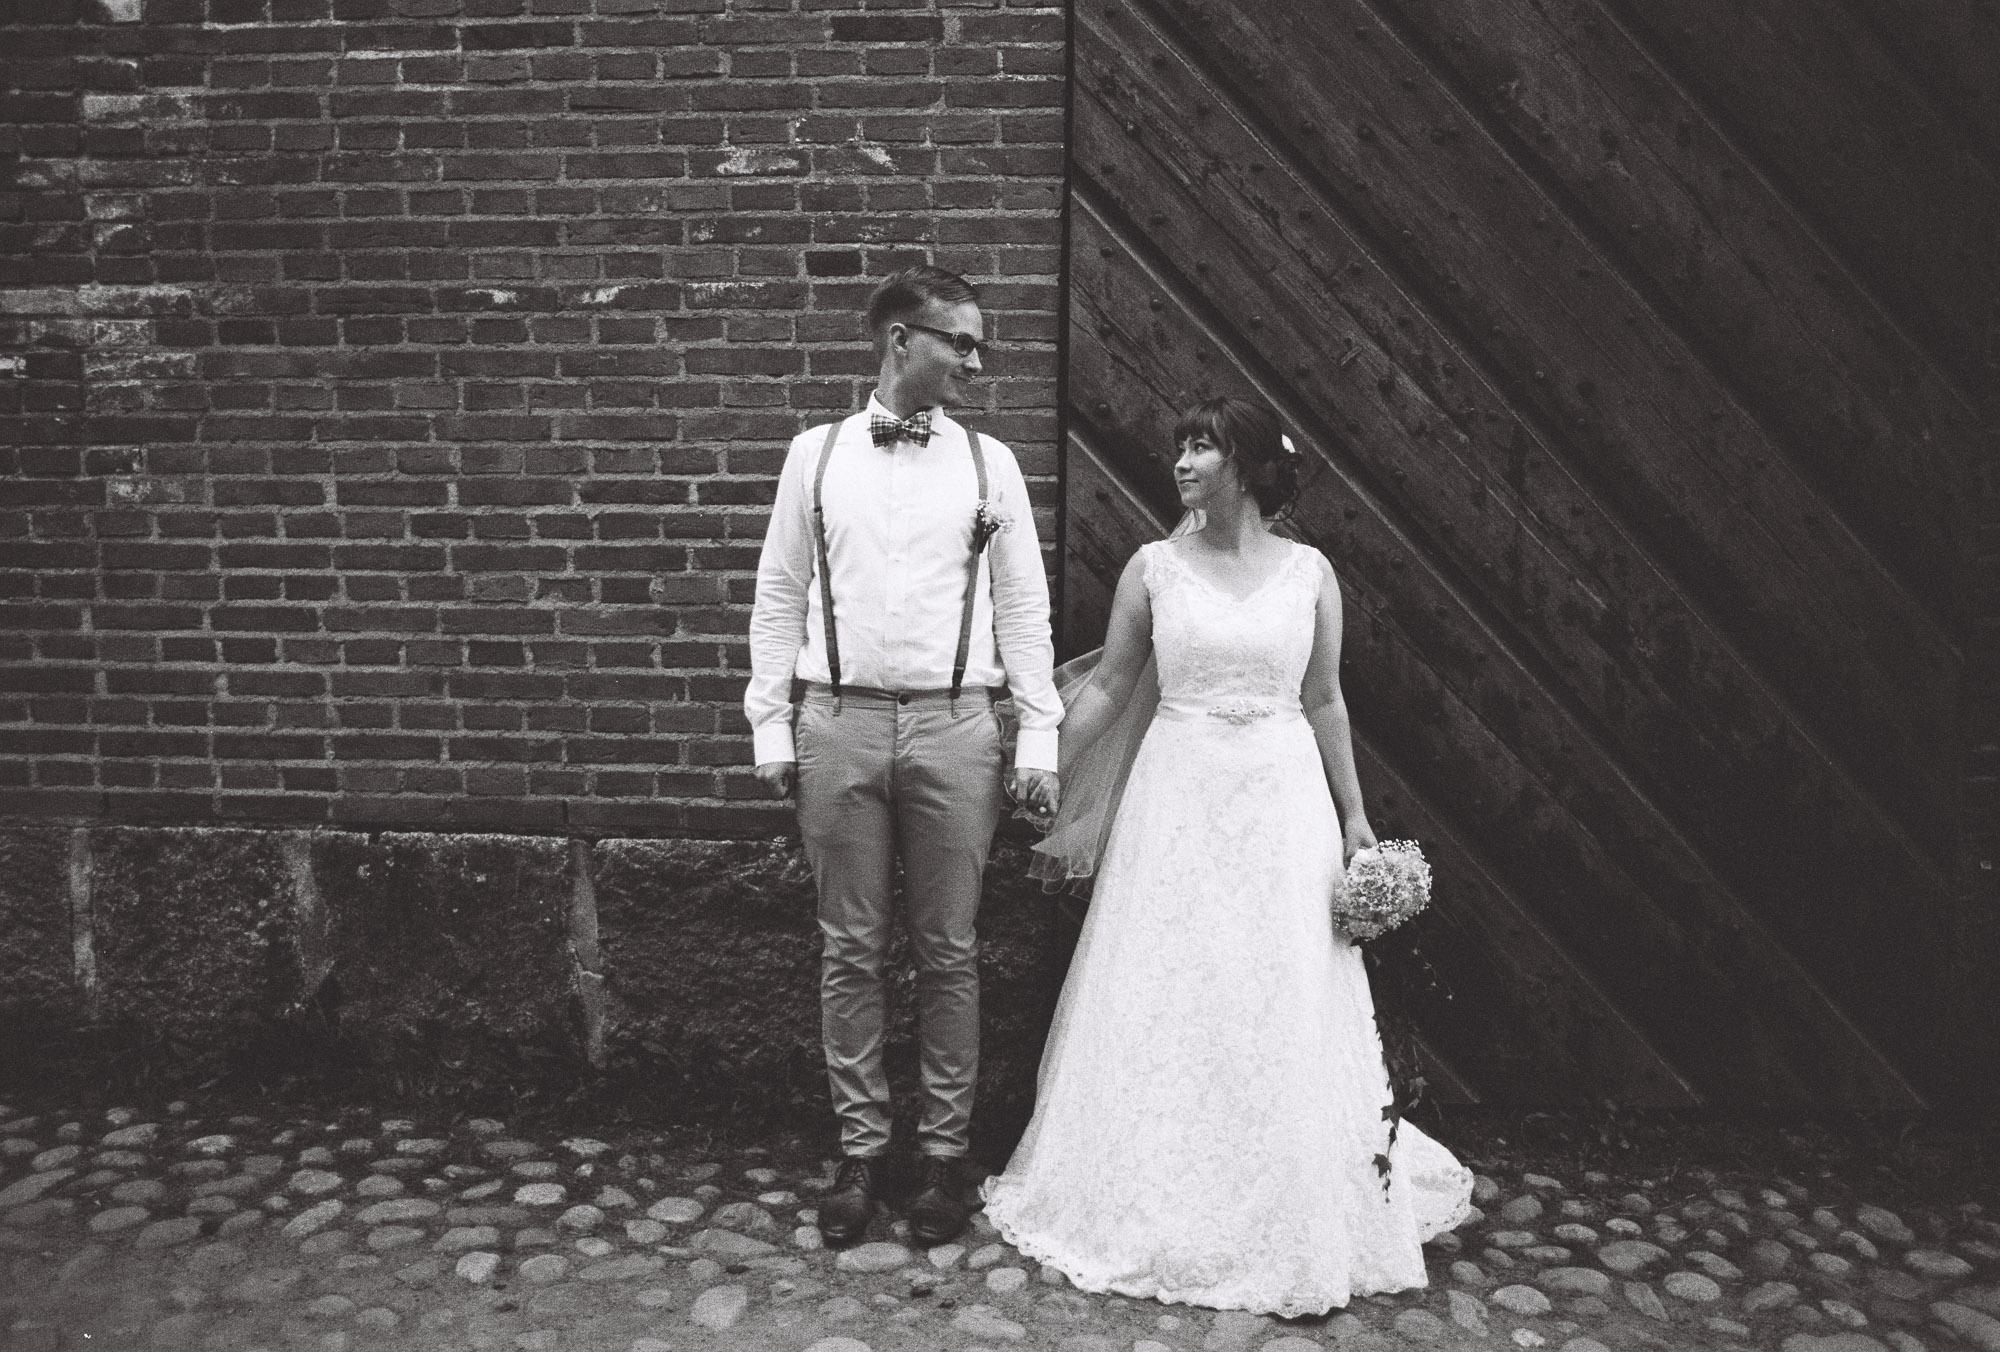 jere-satamo-analog-film-wedding-photographer-finland-167.jpg